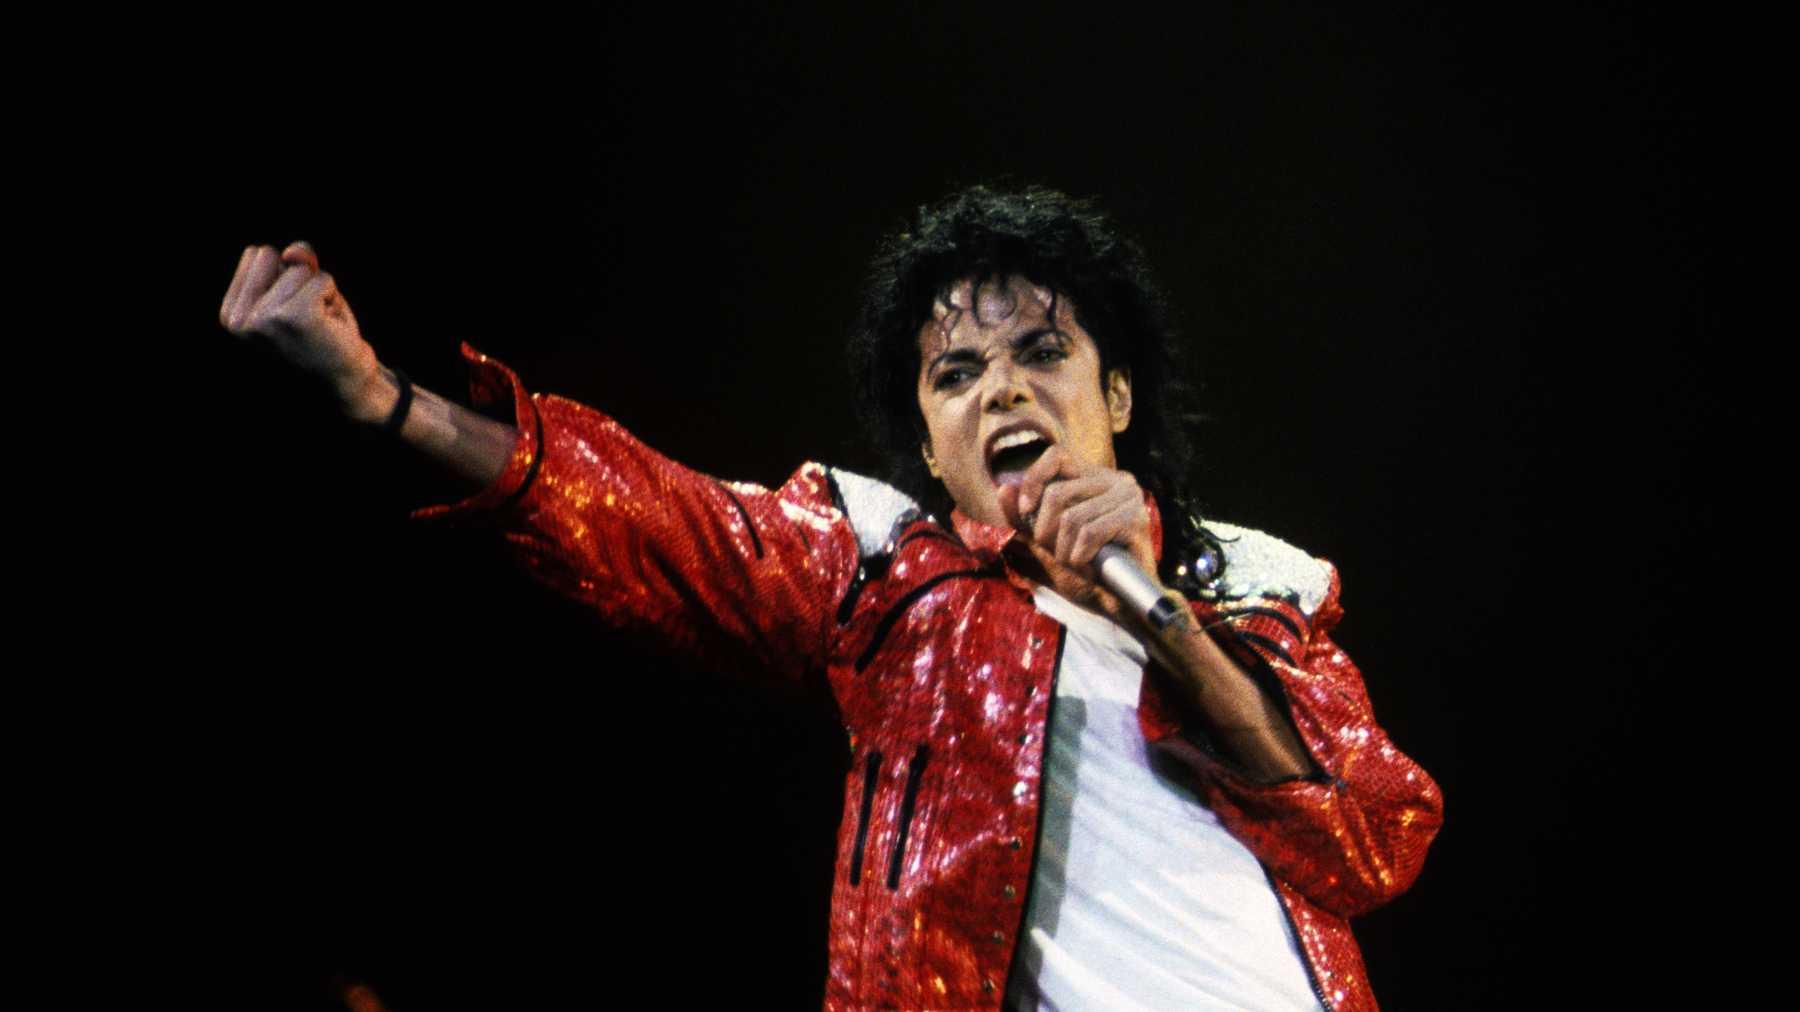 O Johnny Depp θα κάνει μιούζικαλ τη ζωή του Michael Jackson